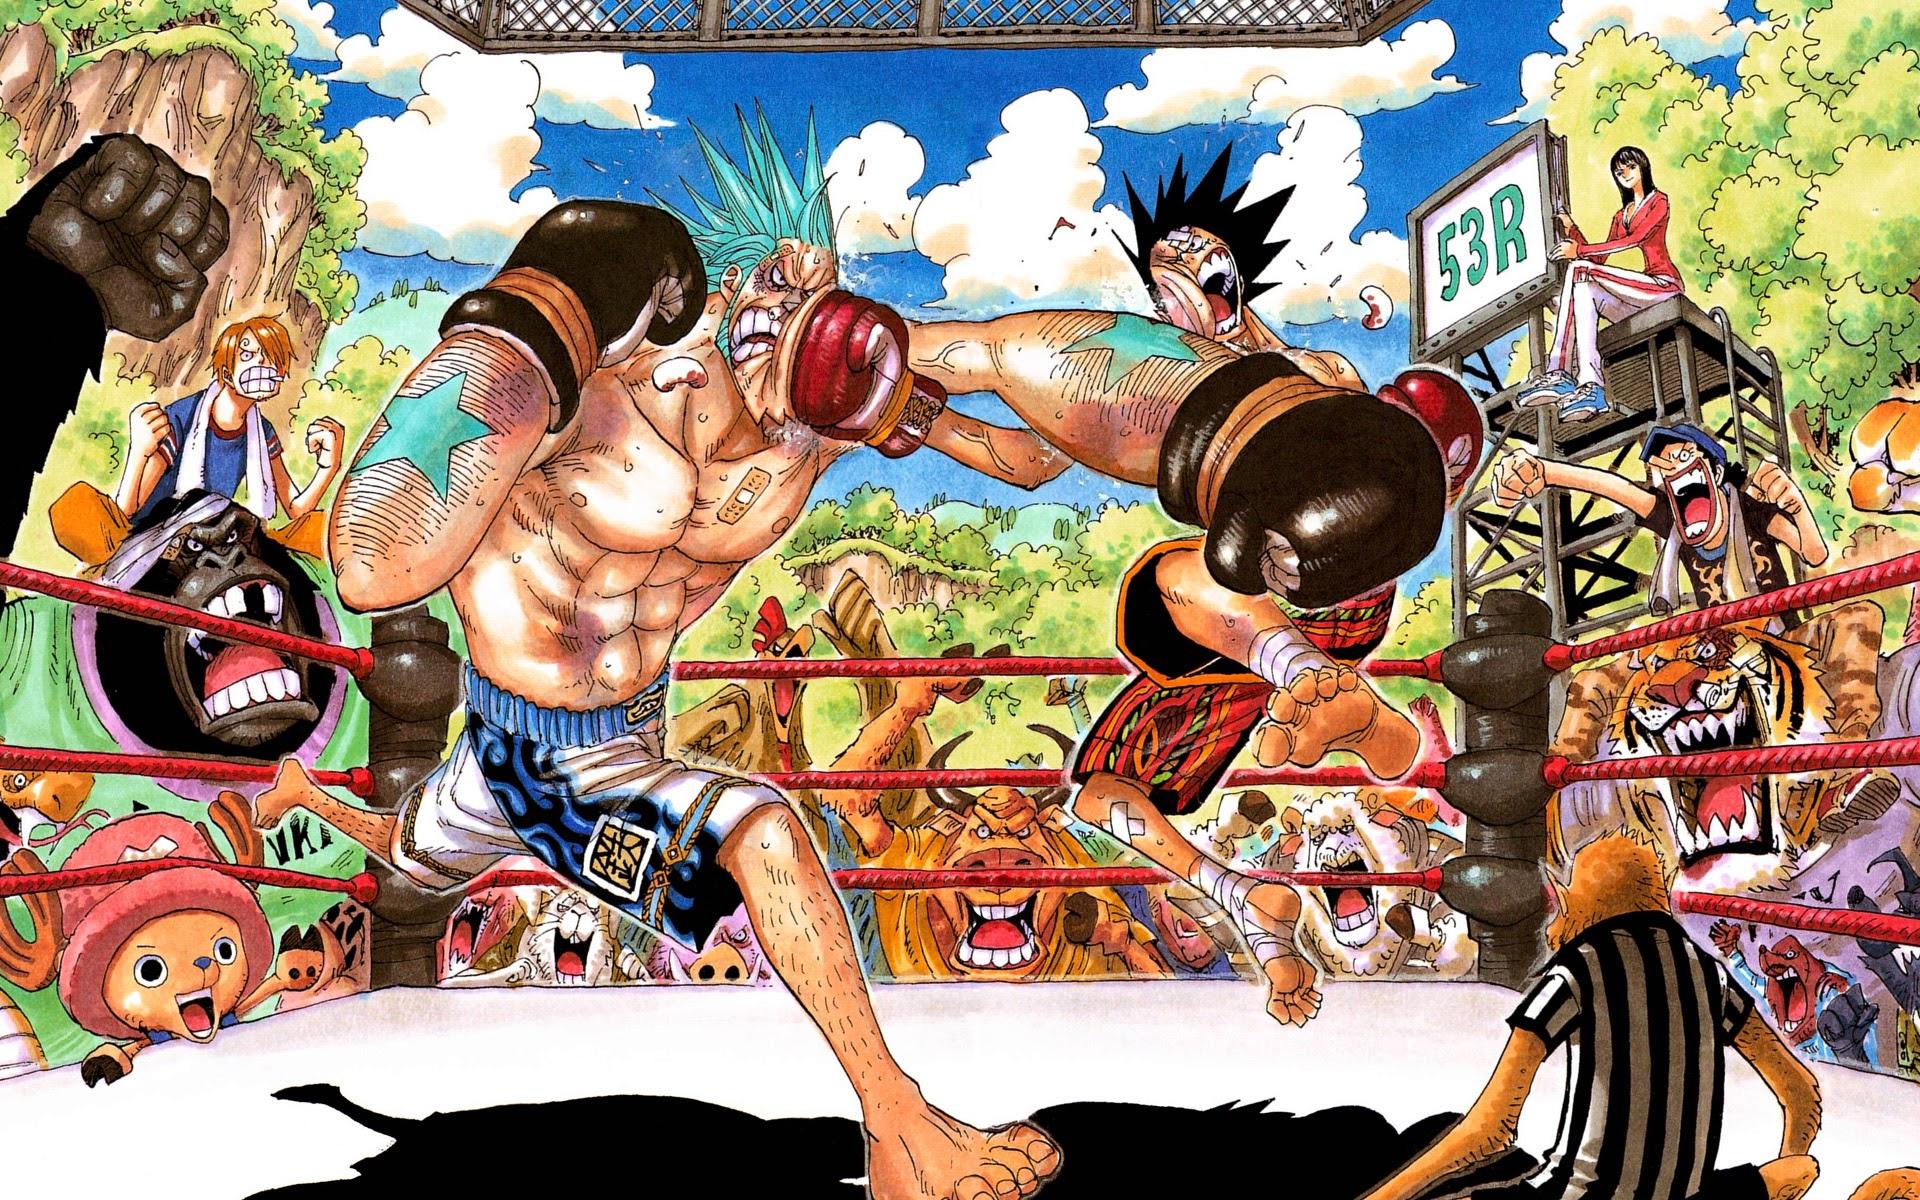 franky vs luffy one piece boxing anime hd wallpaper 1920x1200 0j.